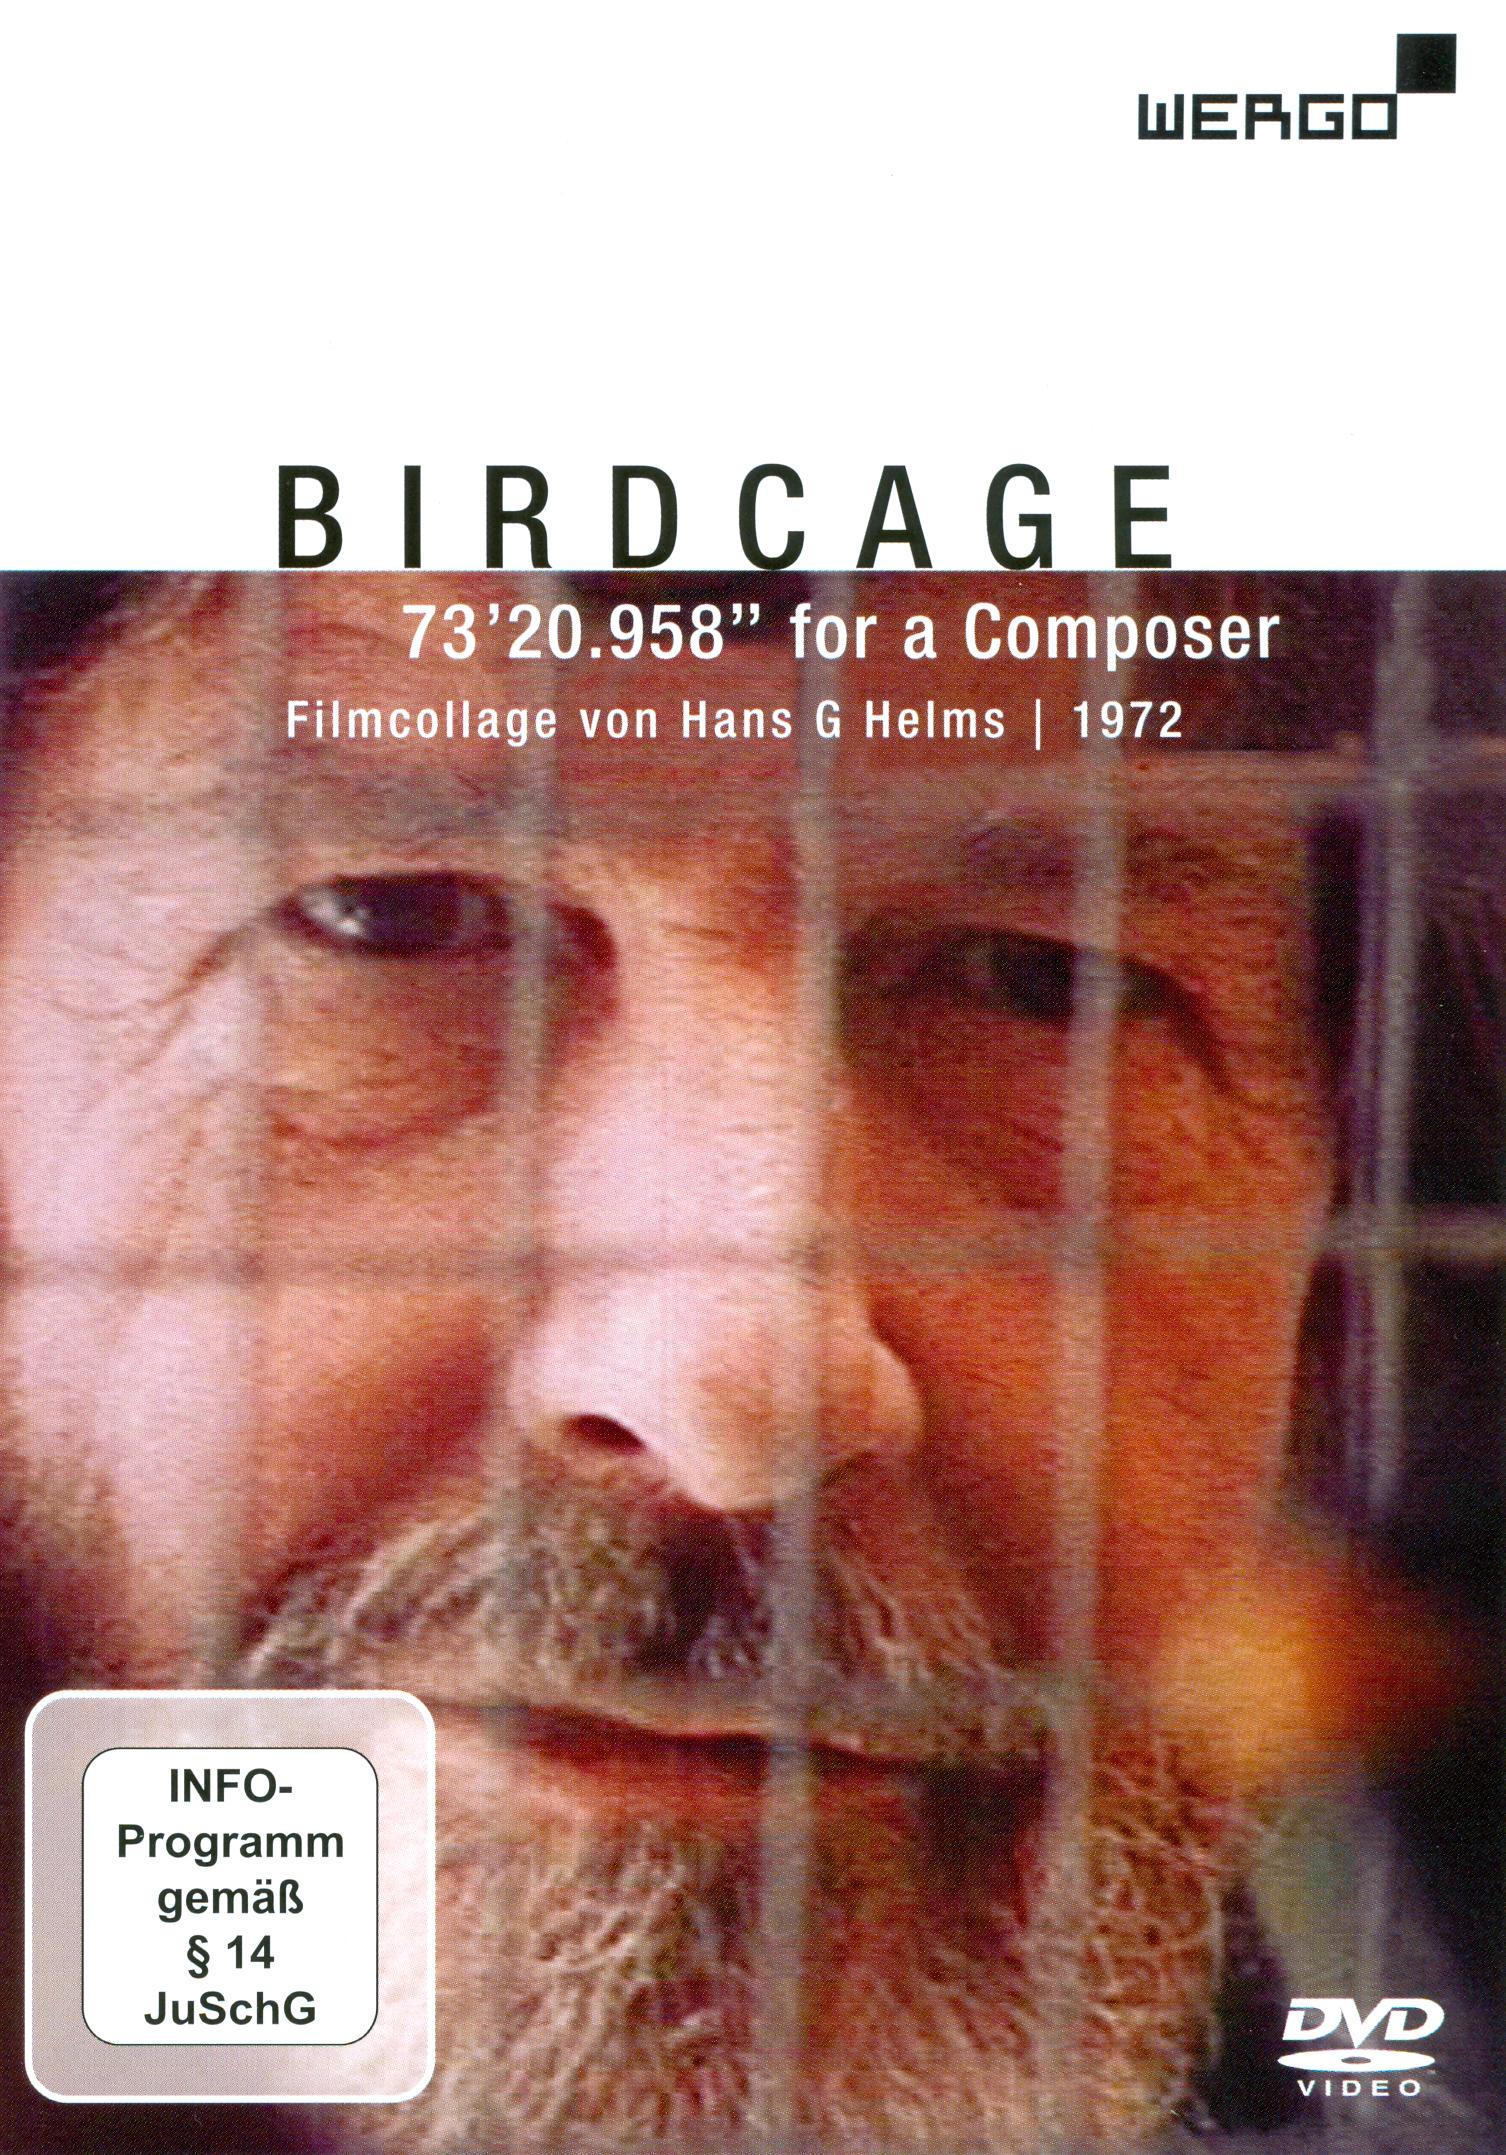 Birdcage: 73'20.958